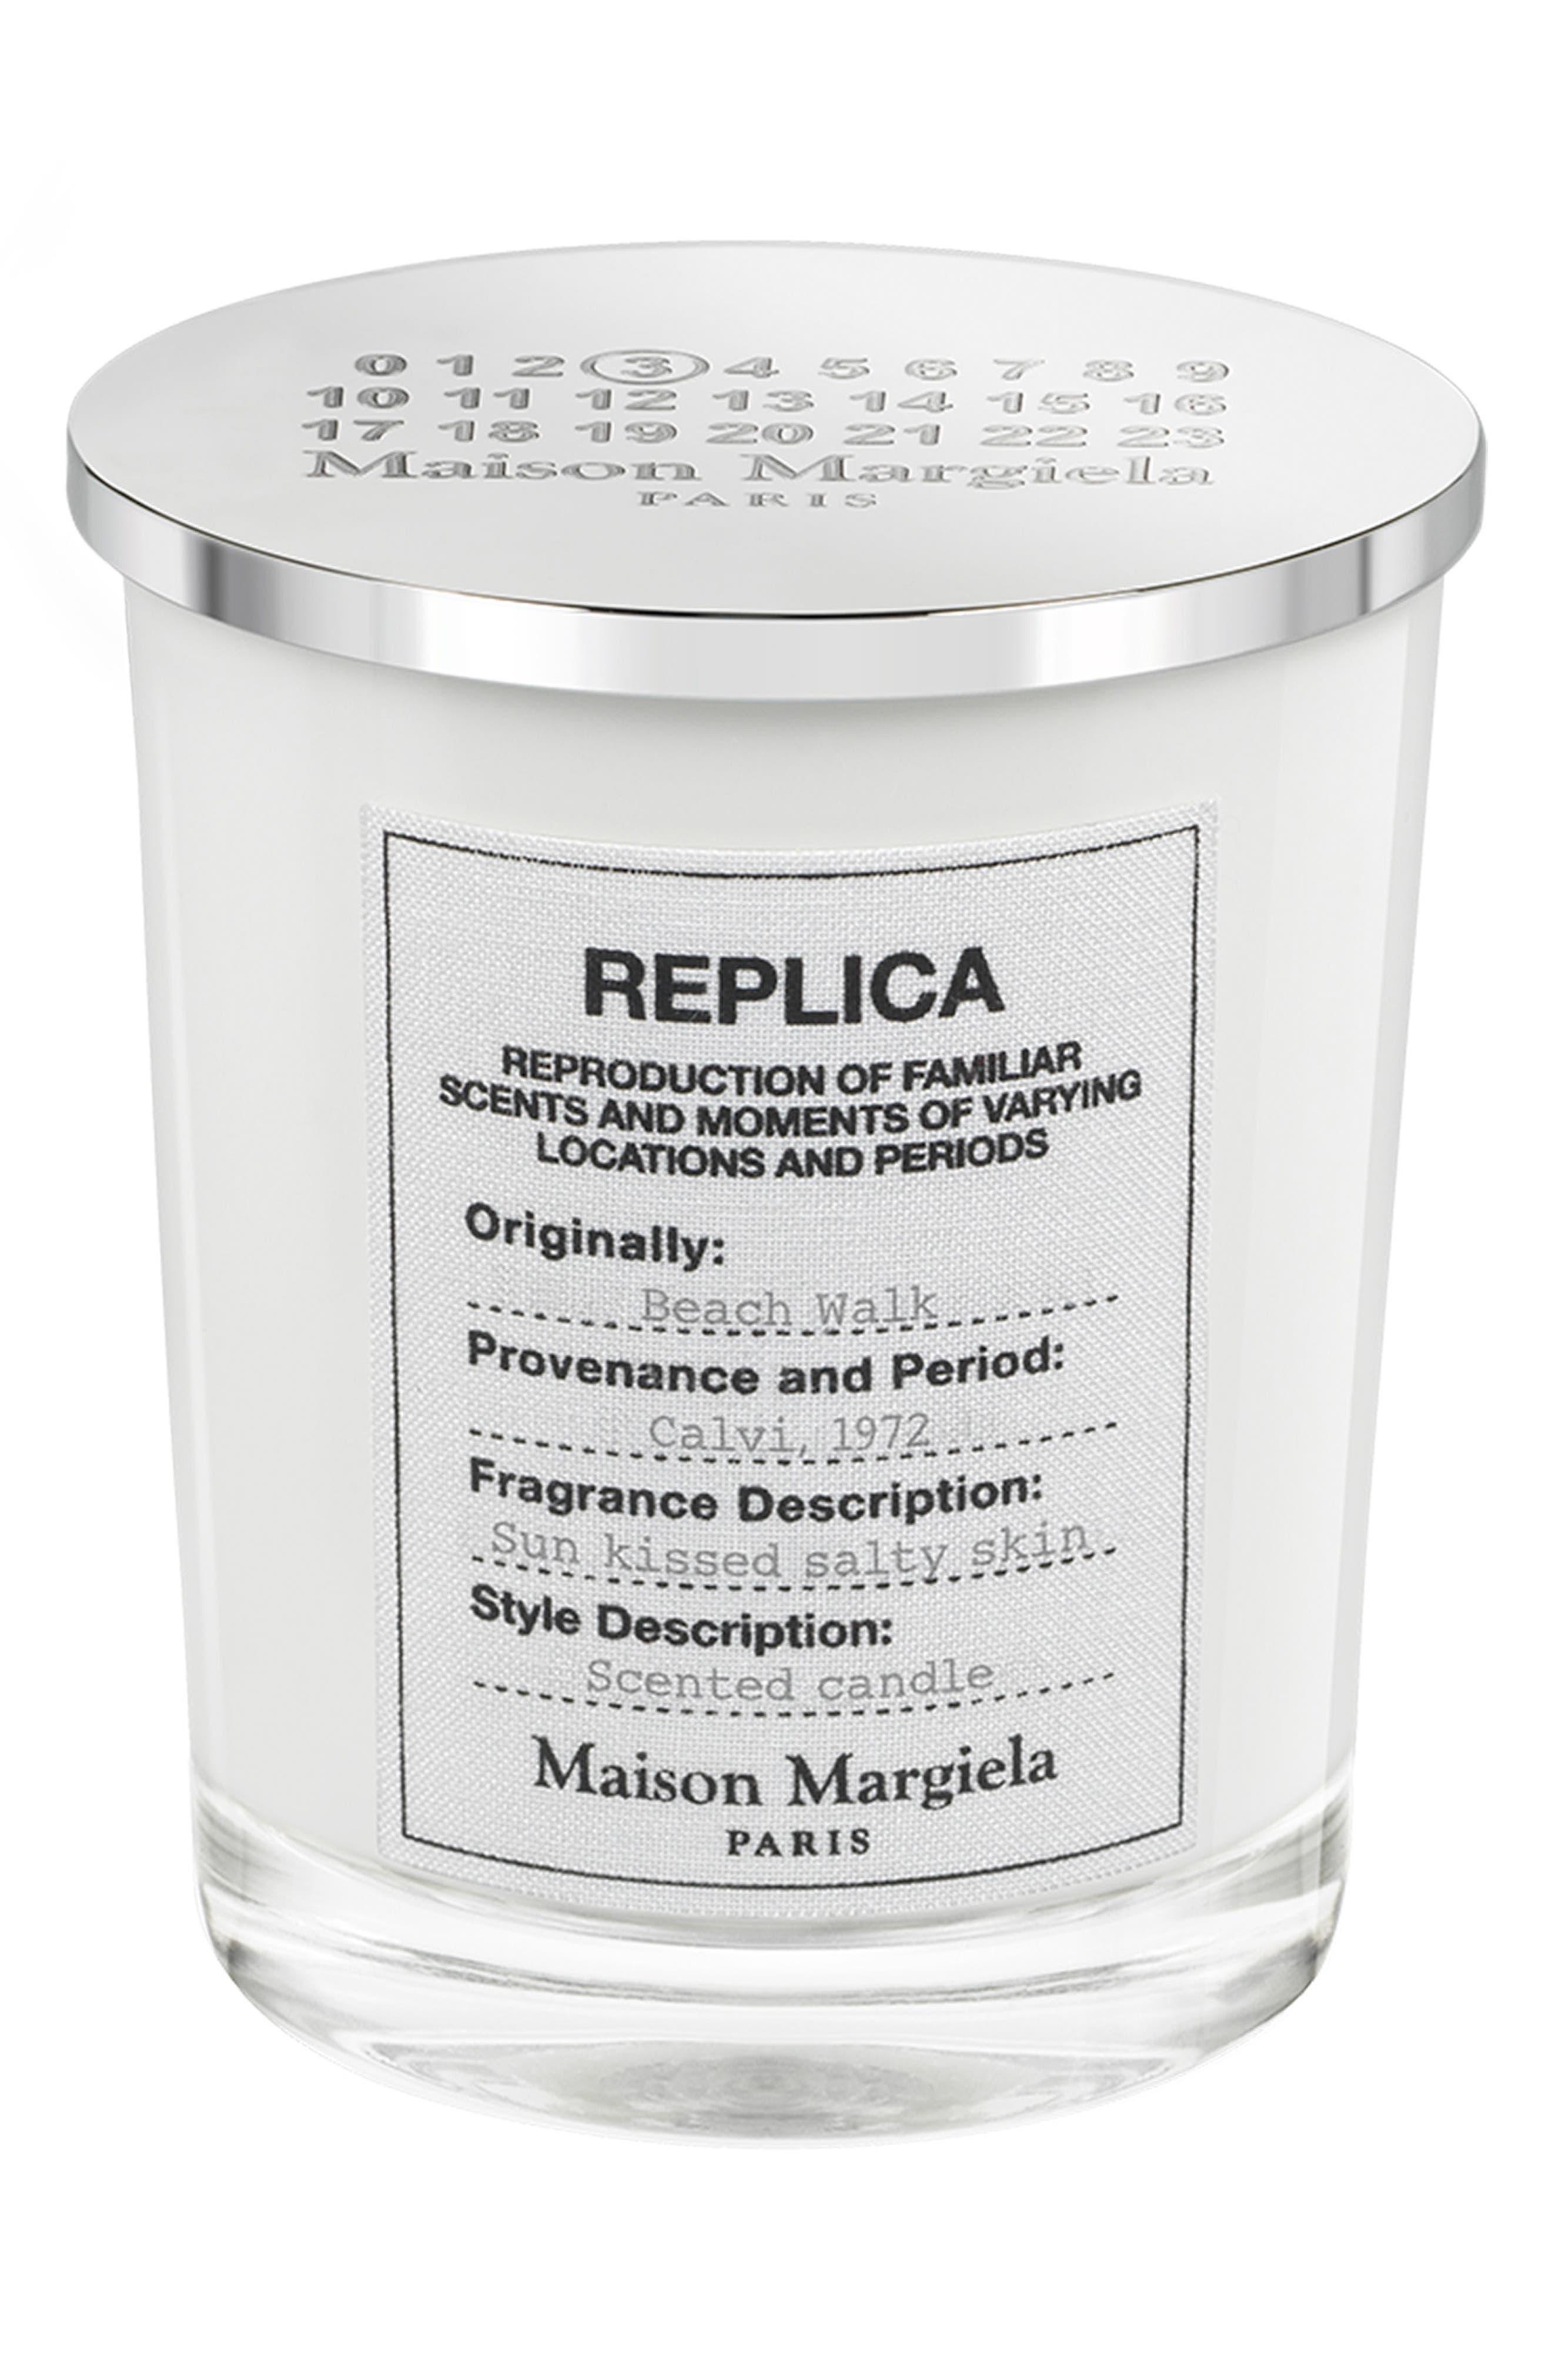 Main Image - Maison Margiela Replica Beach Walk Scented Candle